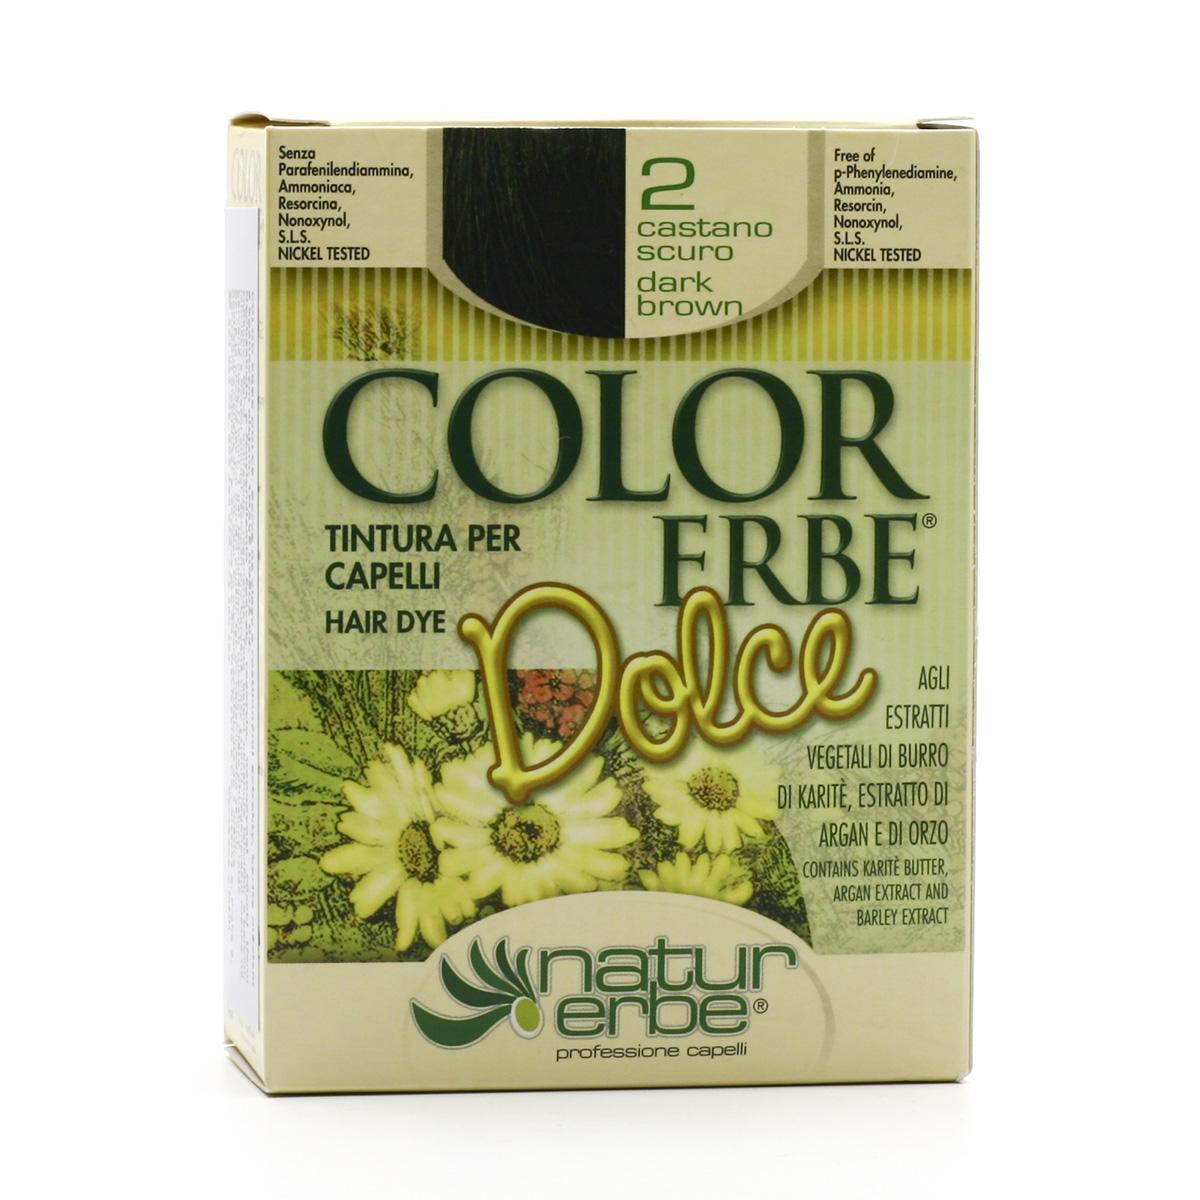 Color Erbe Barva na vlasy Tmavě hnědá 02, Dolce 135 ml